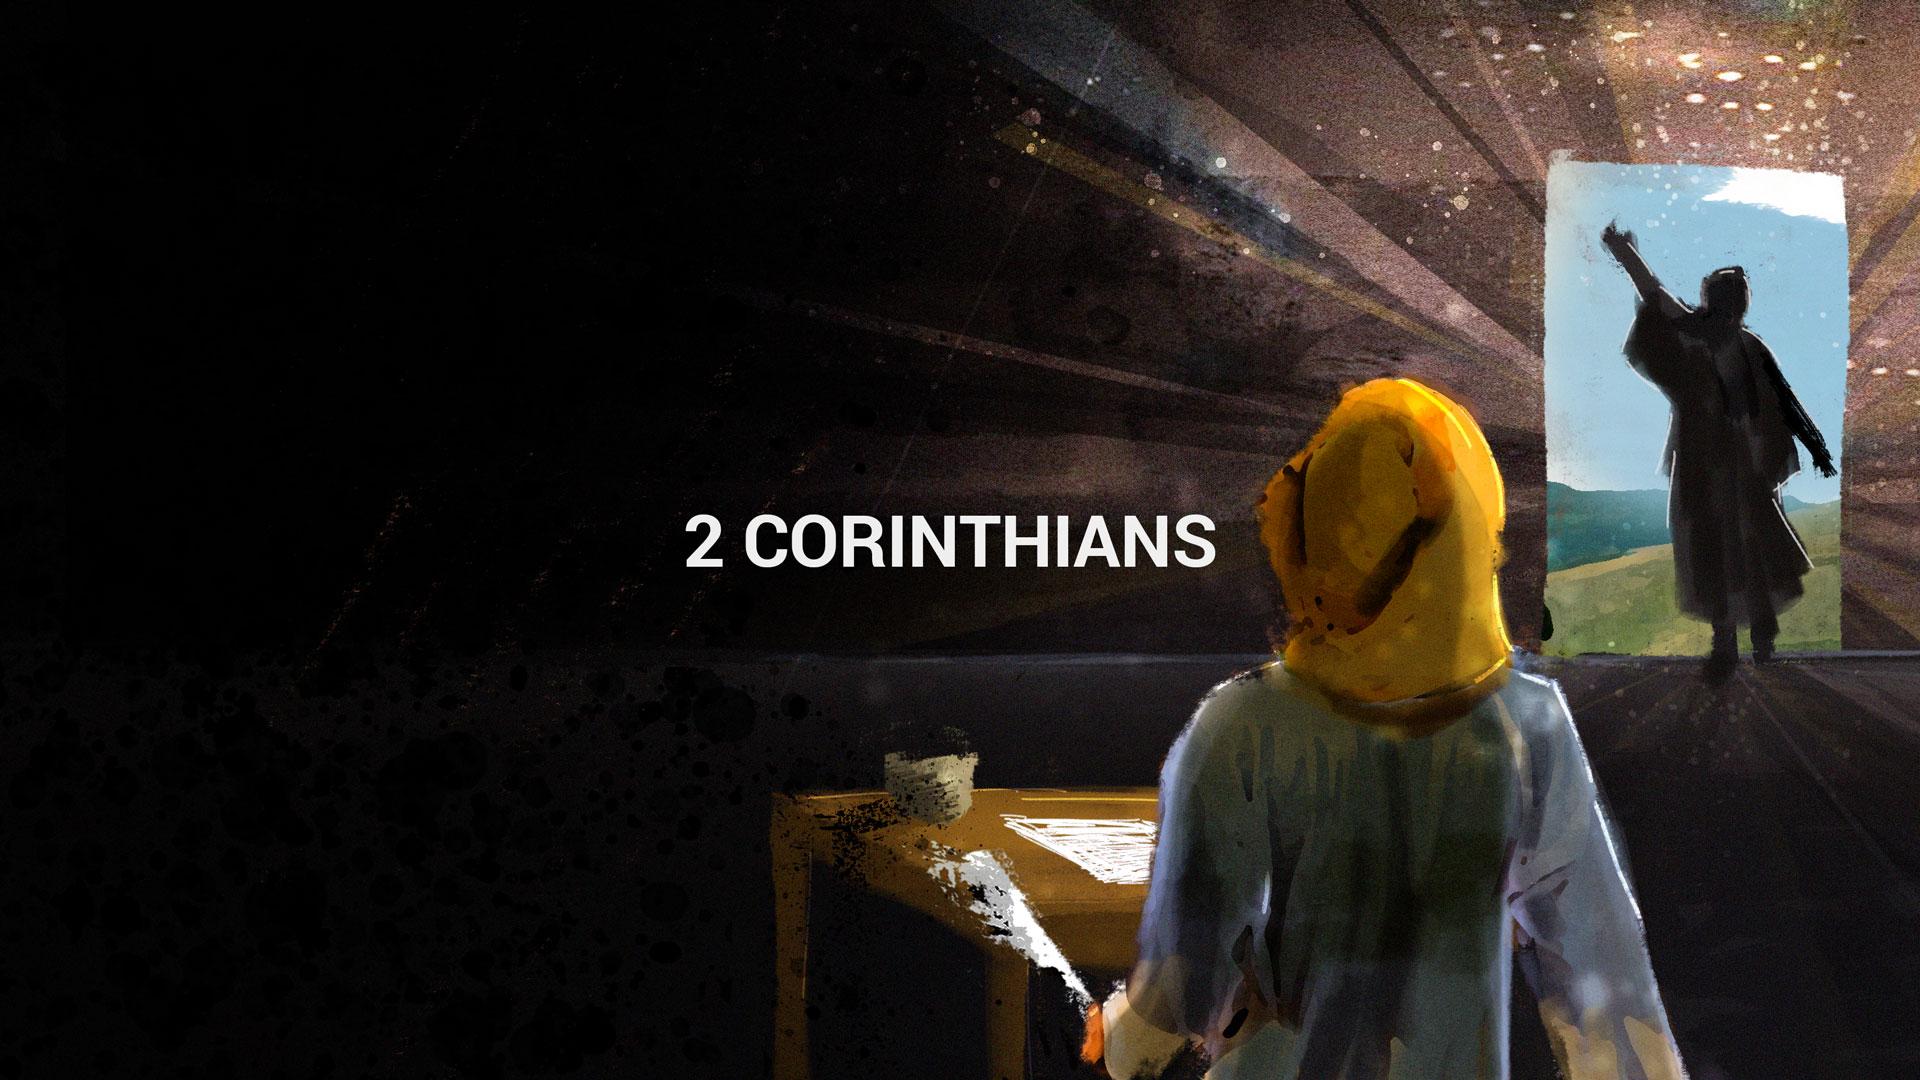 45c39ea987c 2 Corinthians and The Whole Story